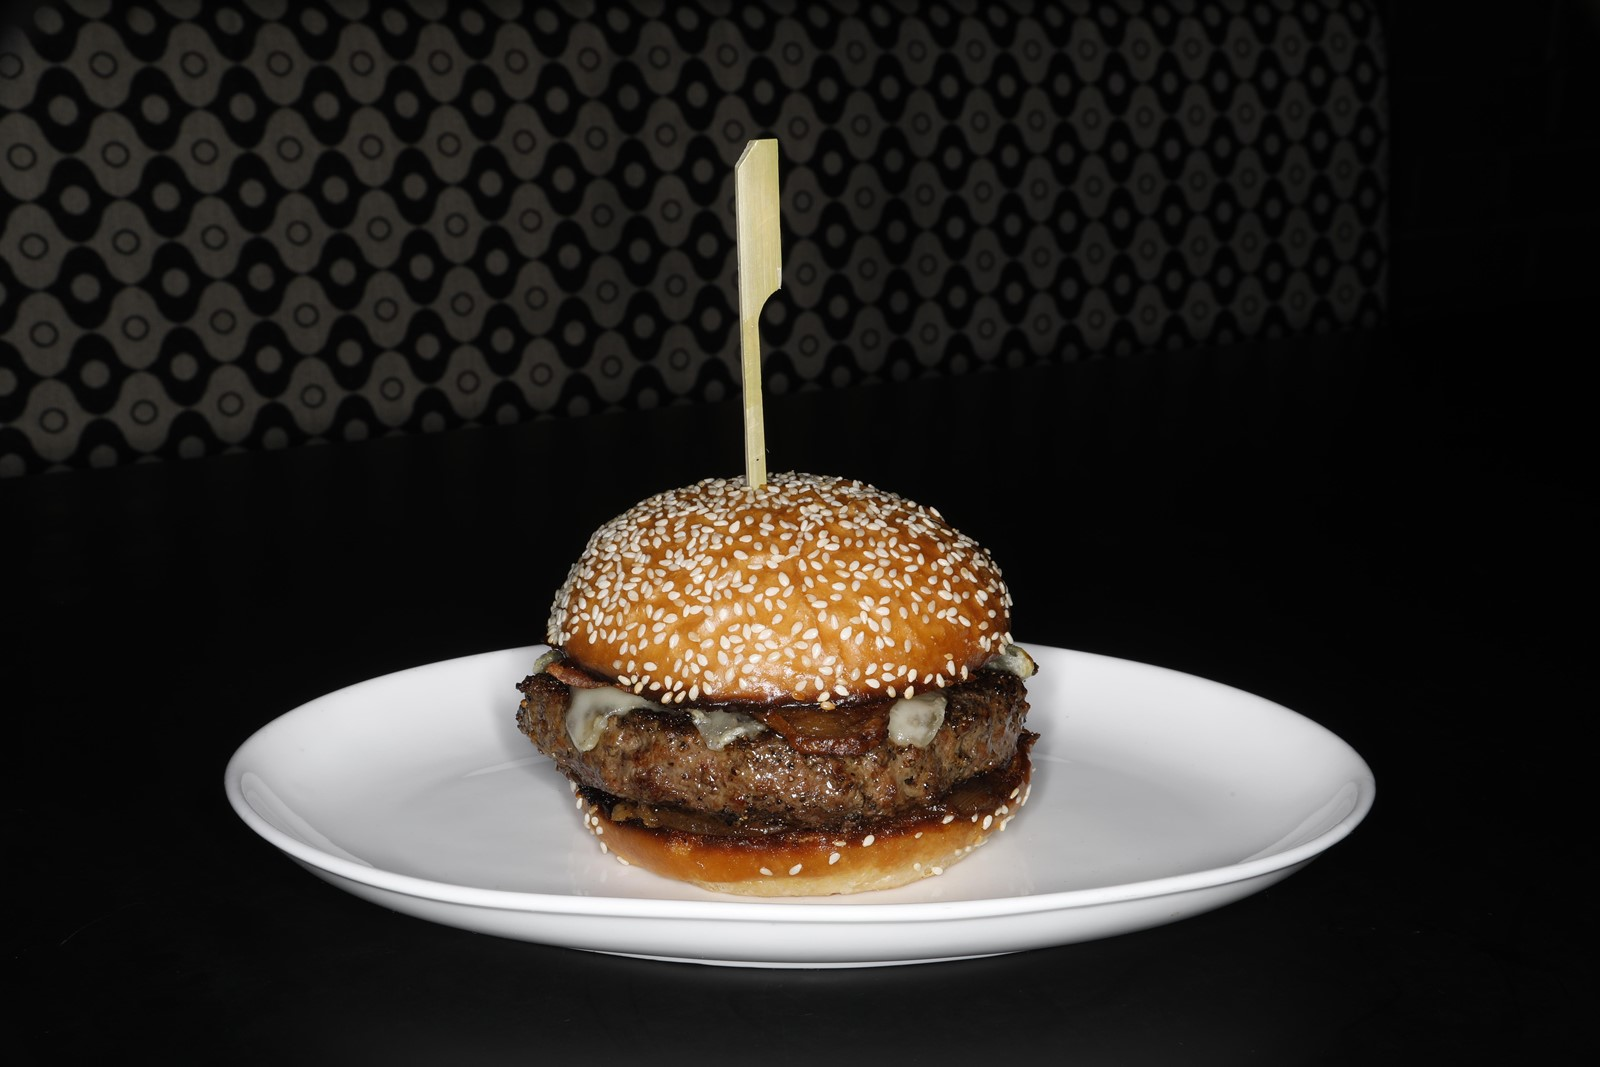 L A 's 21 Essential Burgers